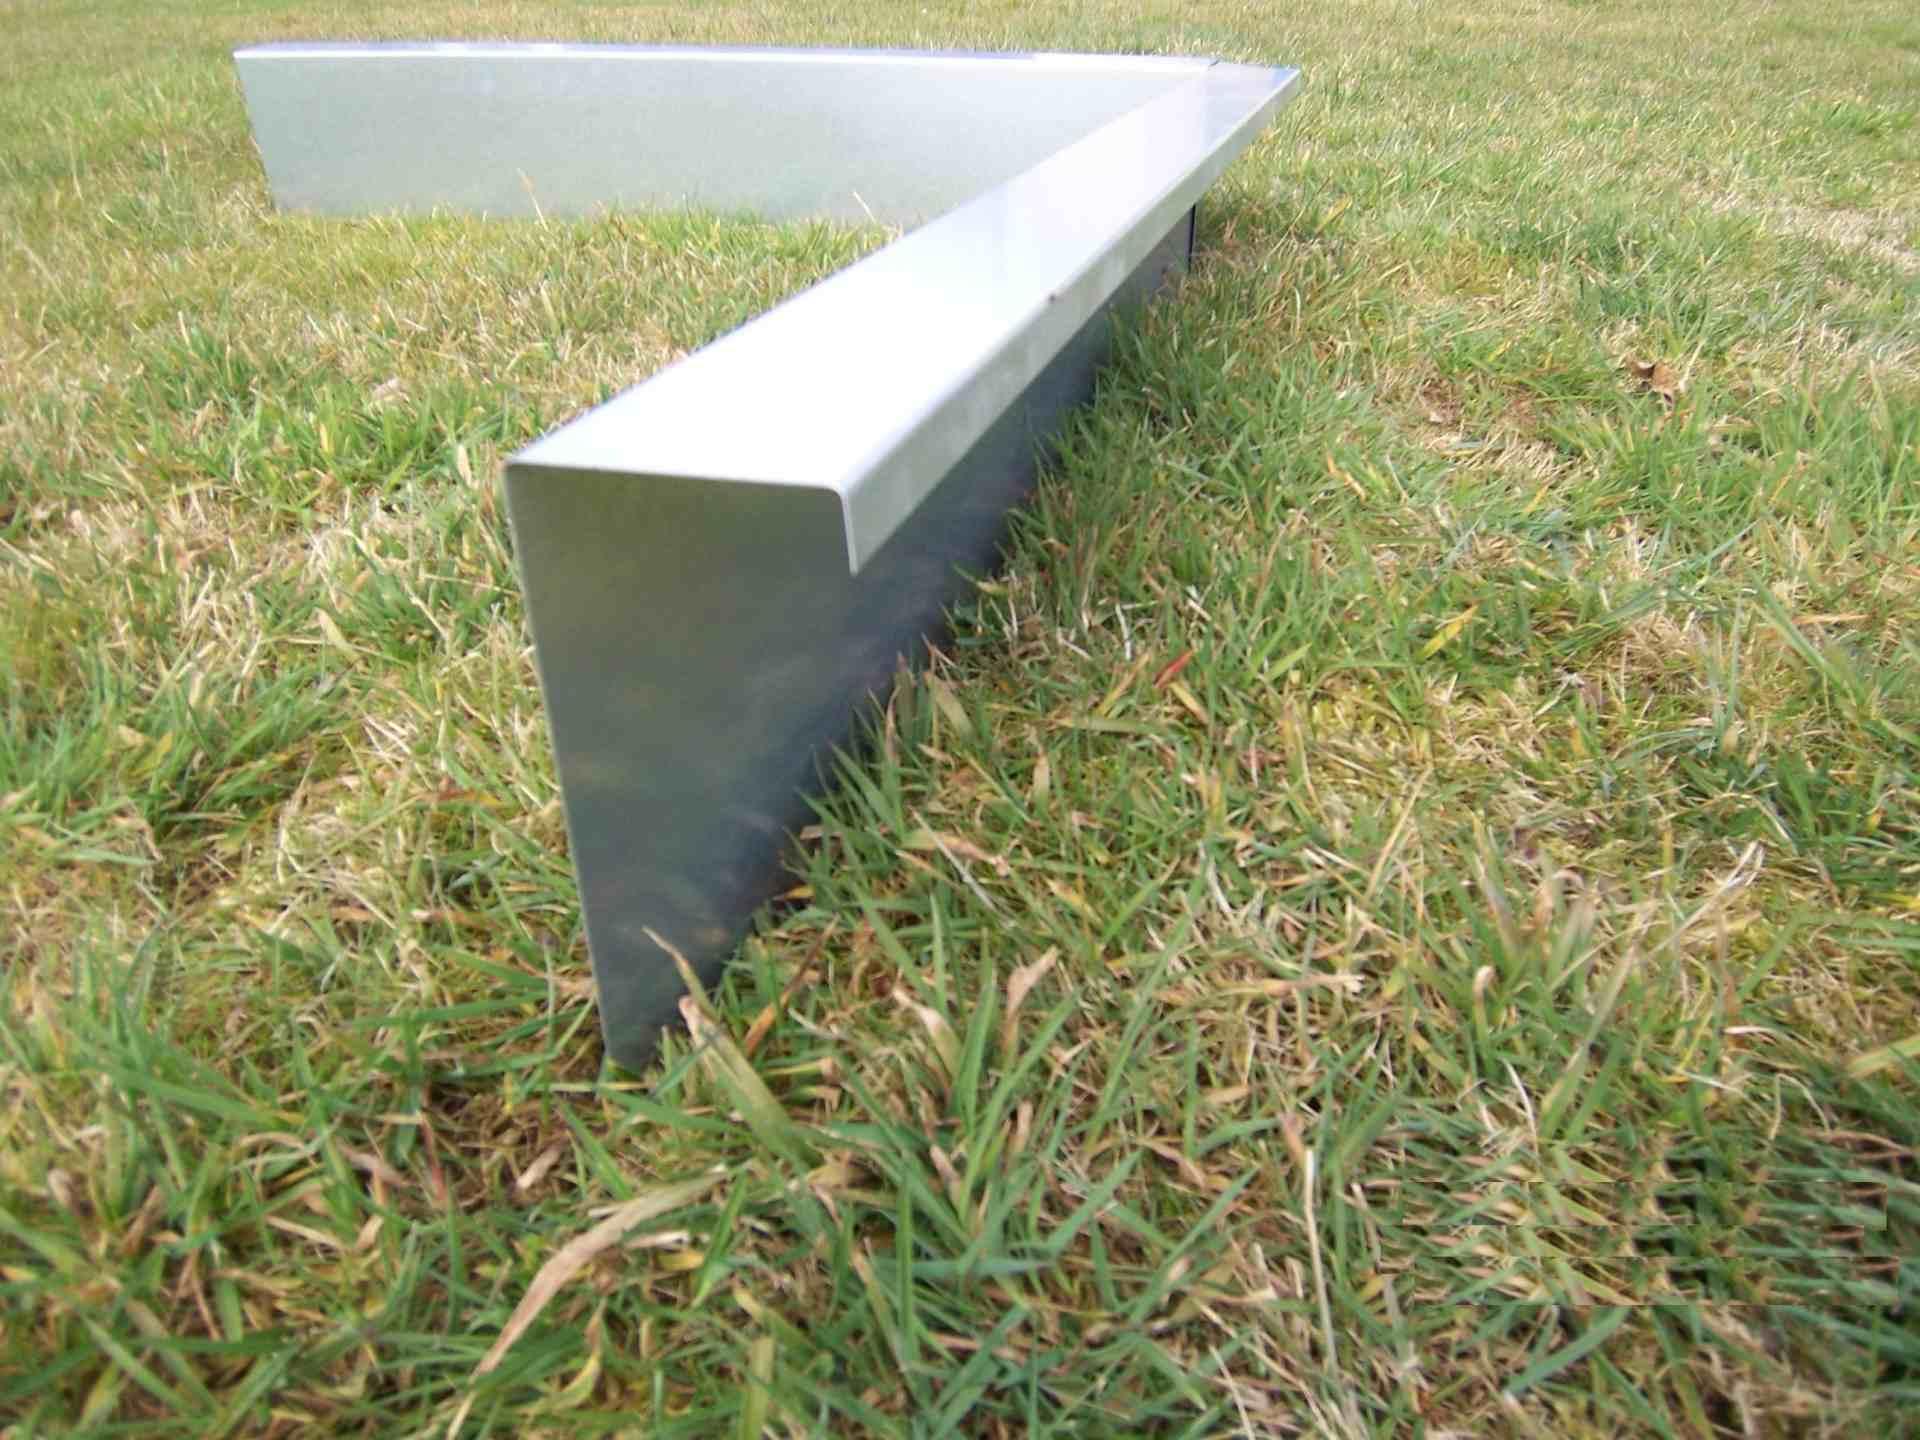 Schneckenzaun aus verzinktem Stahlblech 0,5m Stück